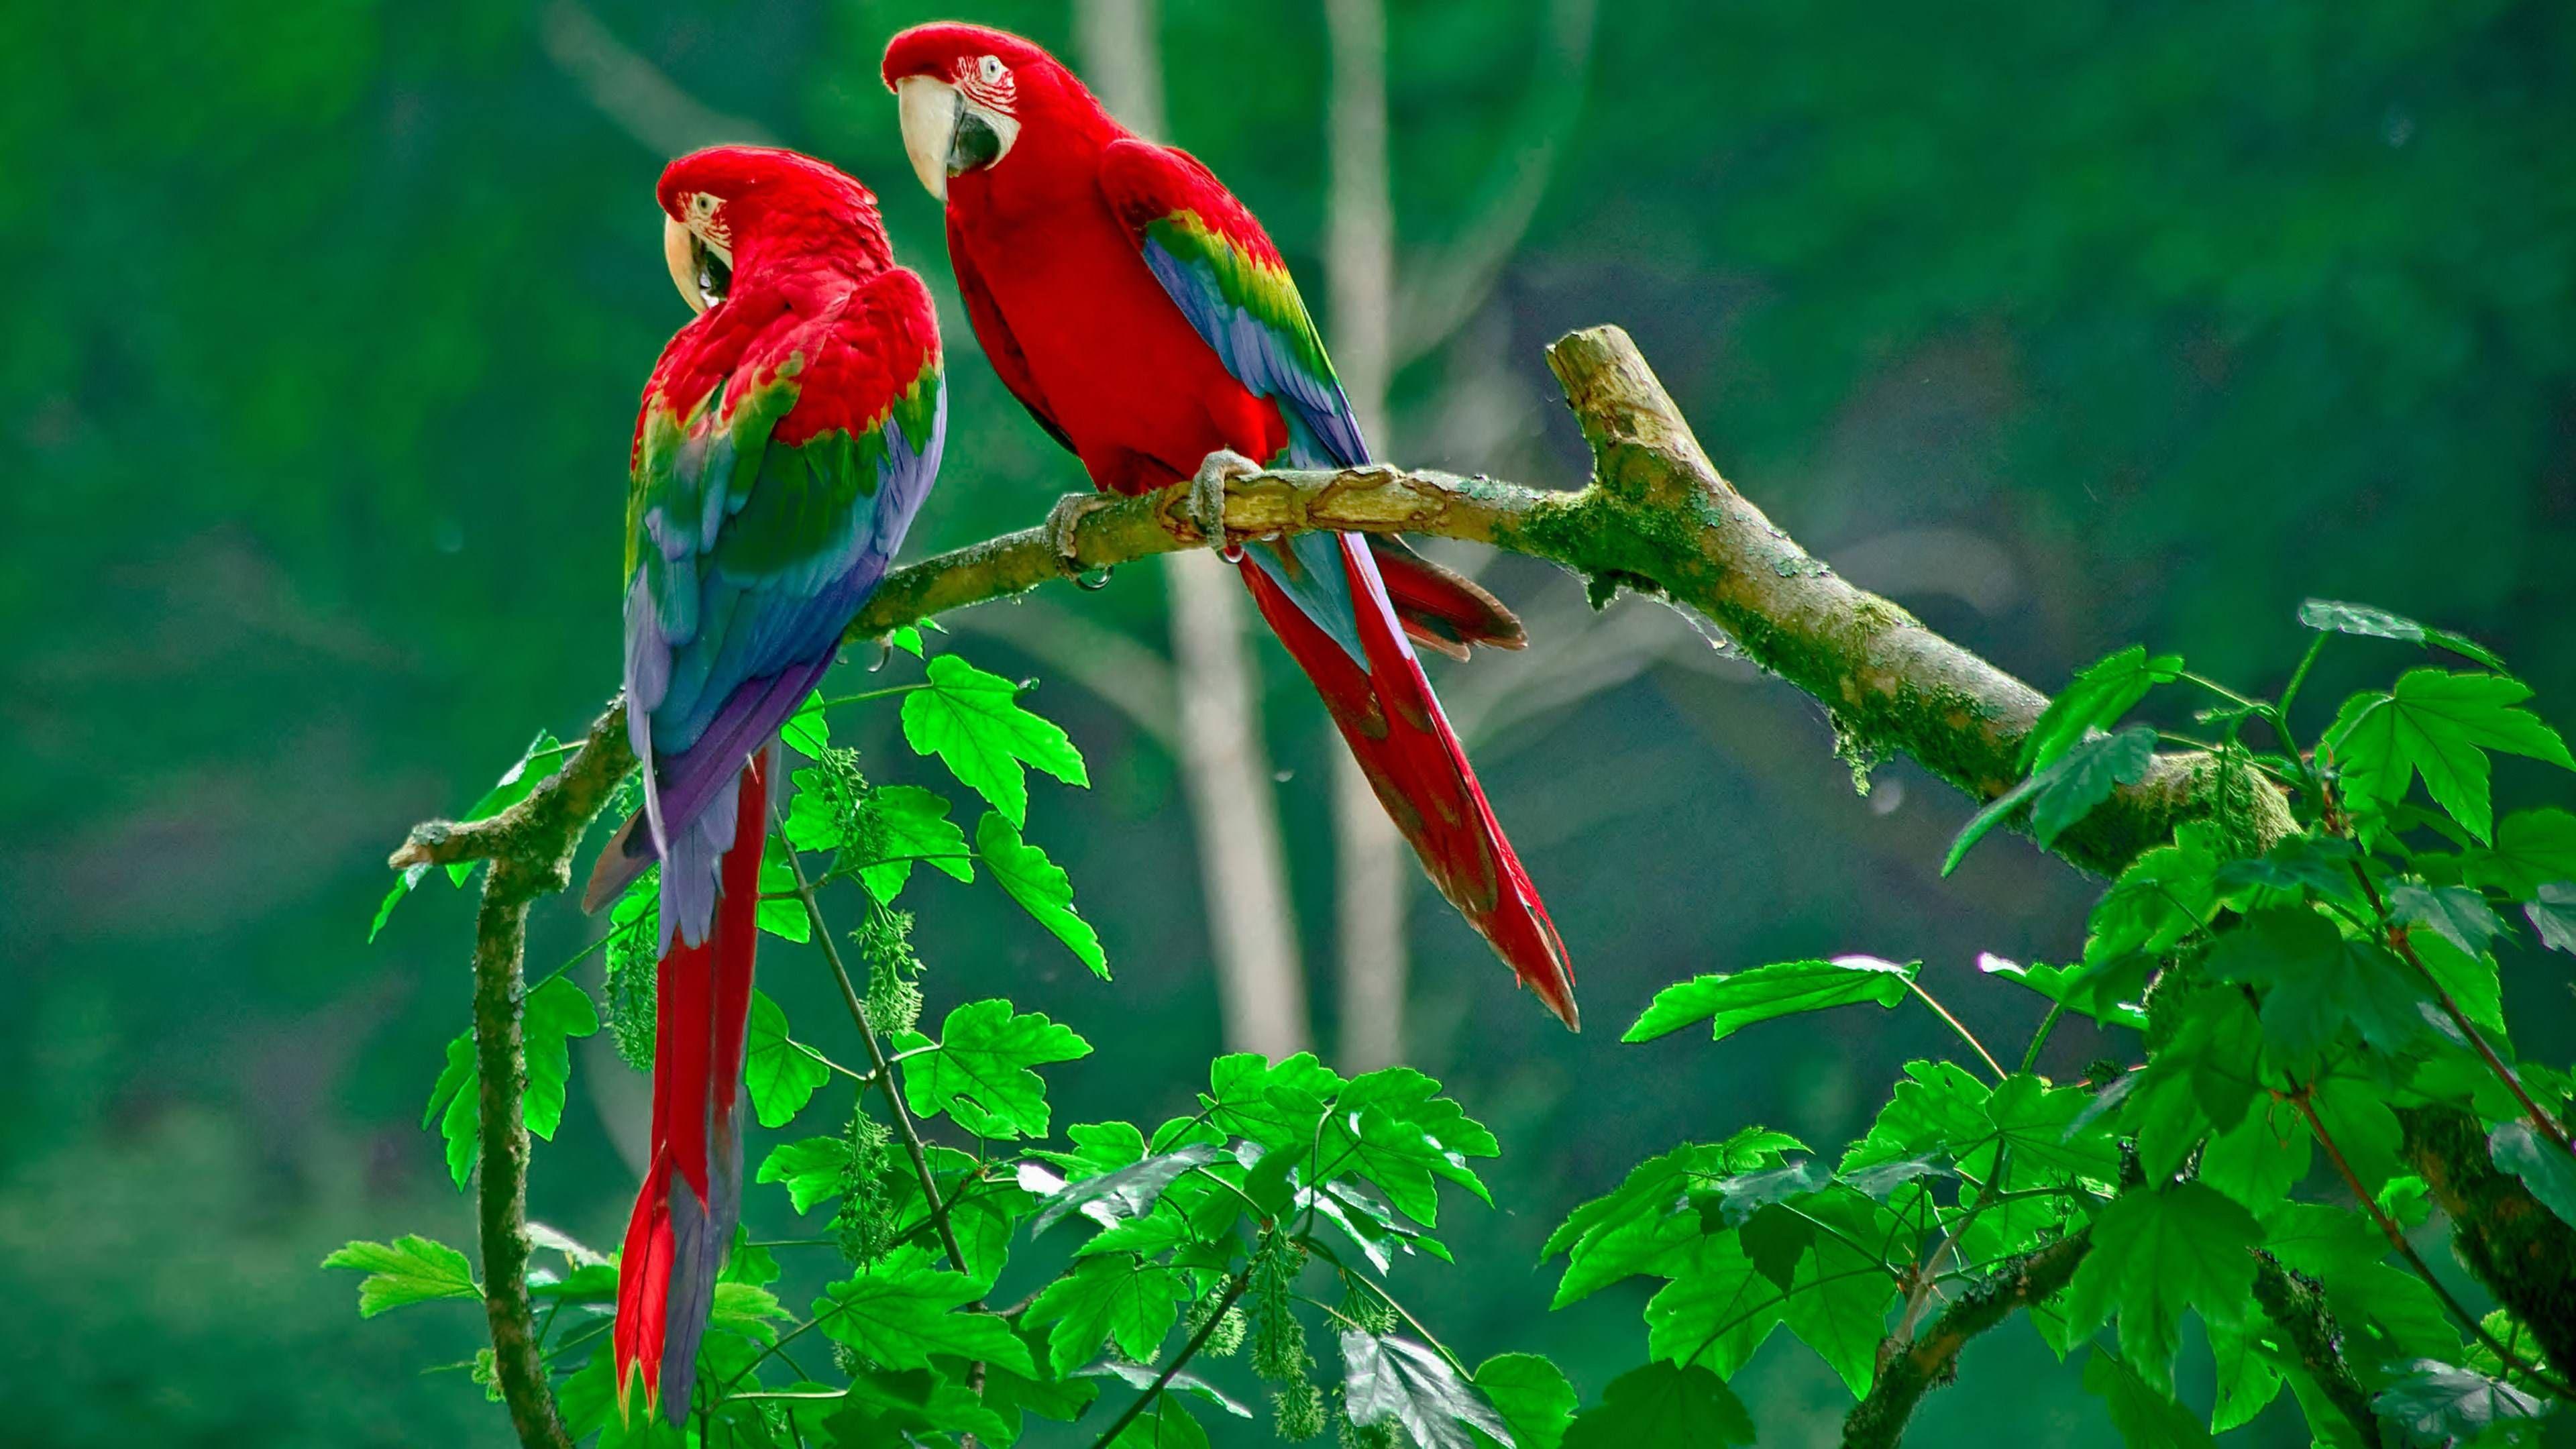 Parrot Wallpapers  Best Games Wallpapers 3840x2160